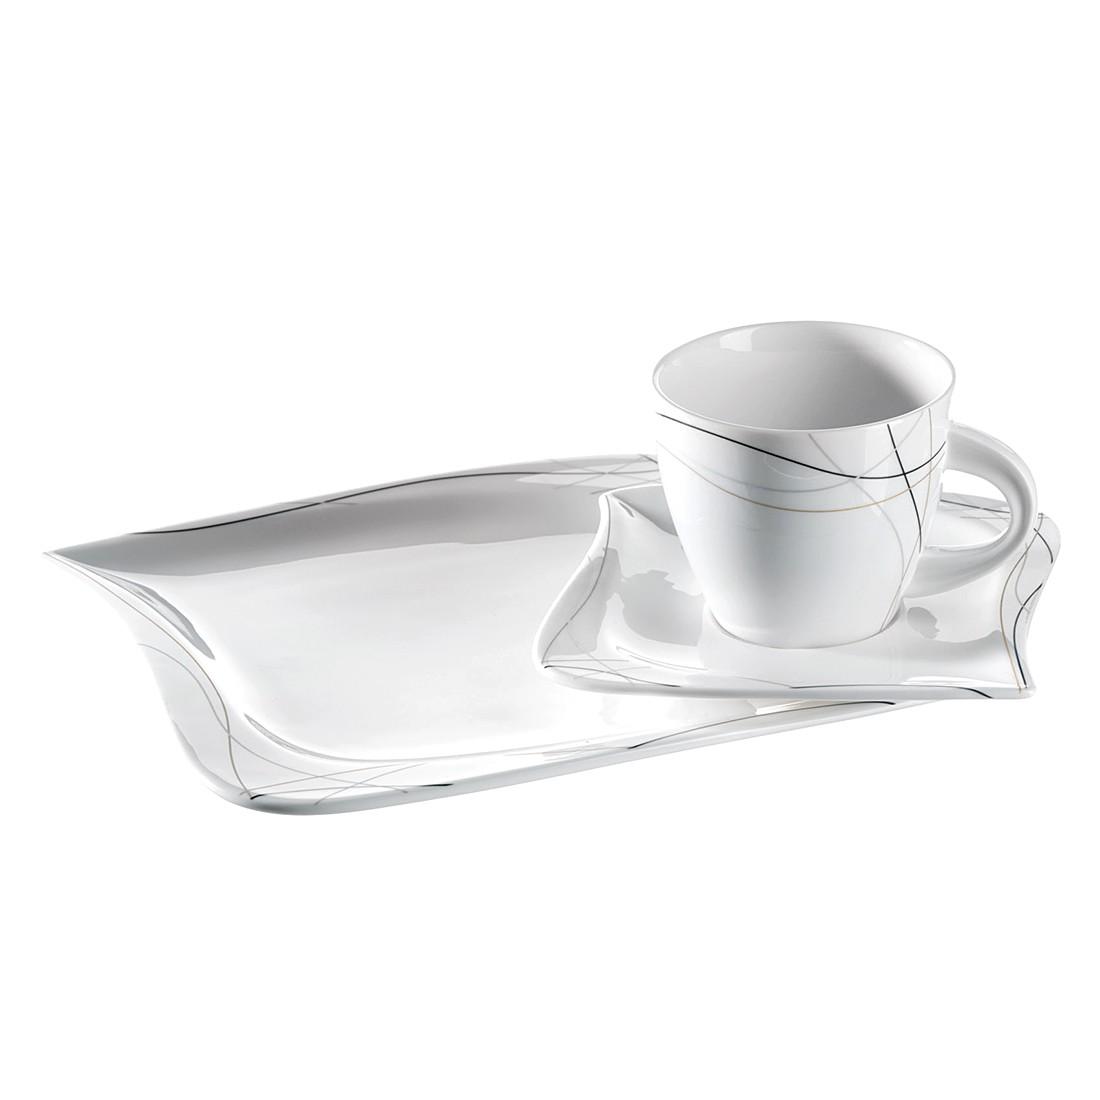 Kaffeeservice (18- teilig) Caprice – Porzellan/Mehrfarbig, Mäser günstig kaufen